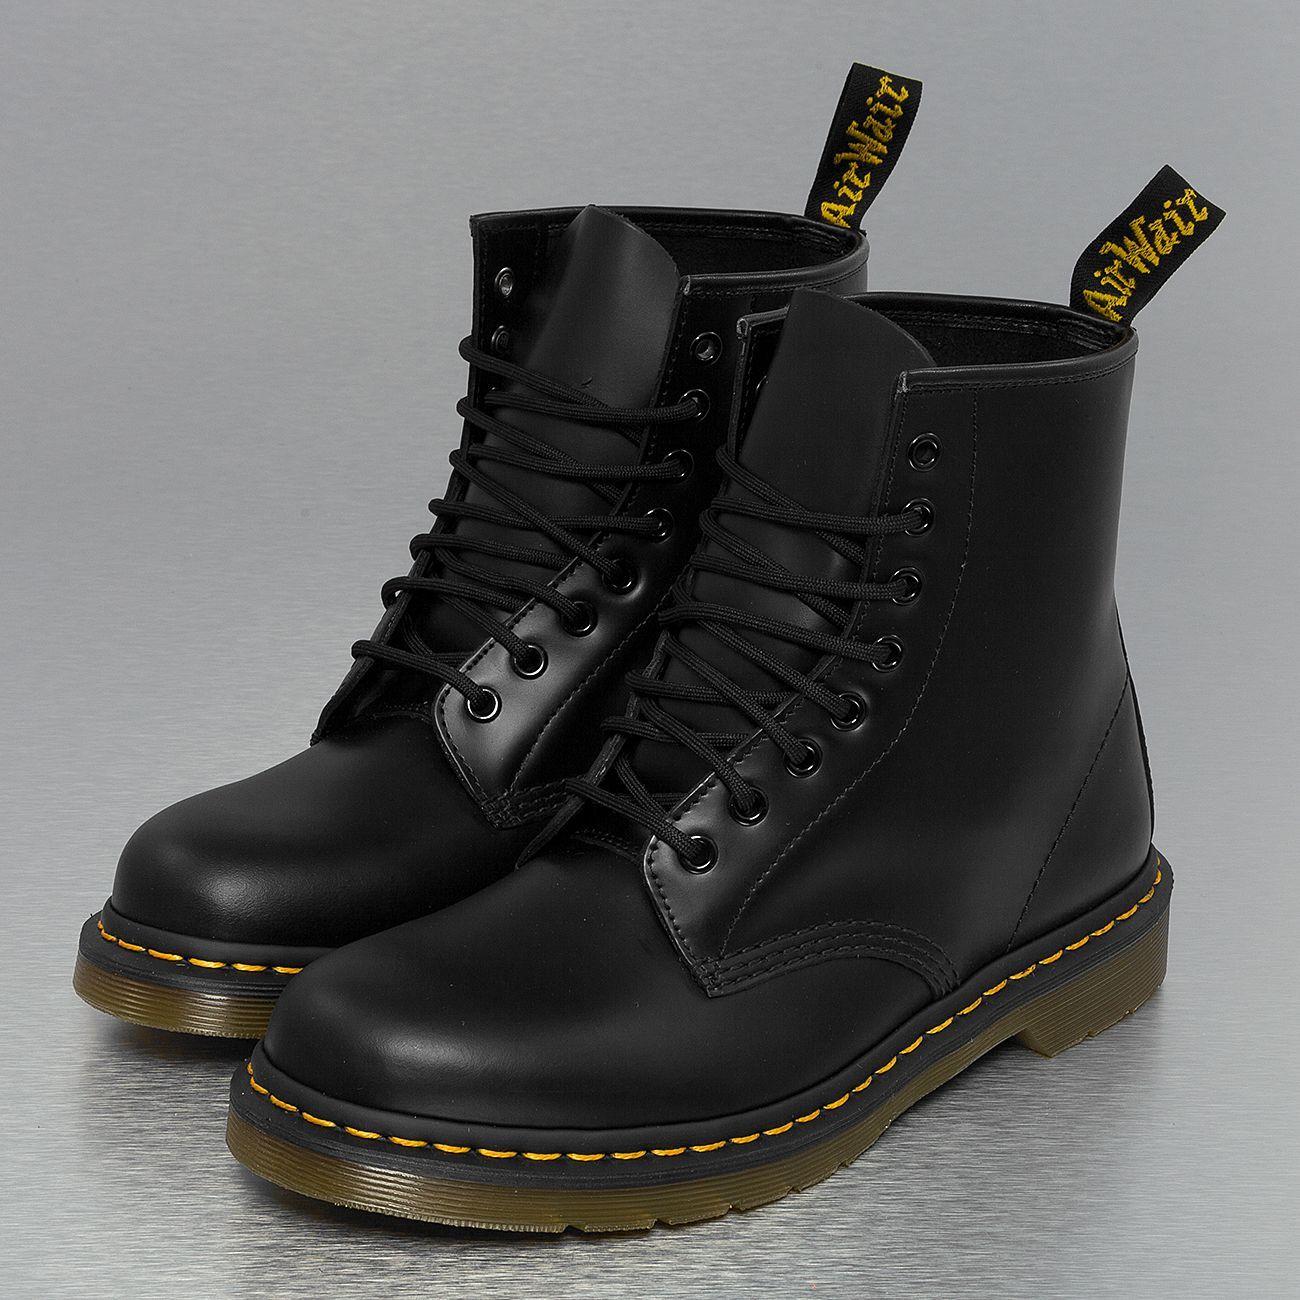 Mee Shoes Damen suuml;szlig; mit Borte chunky heels Pumps